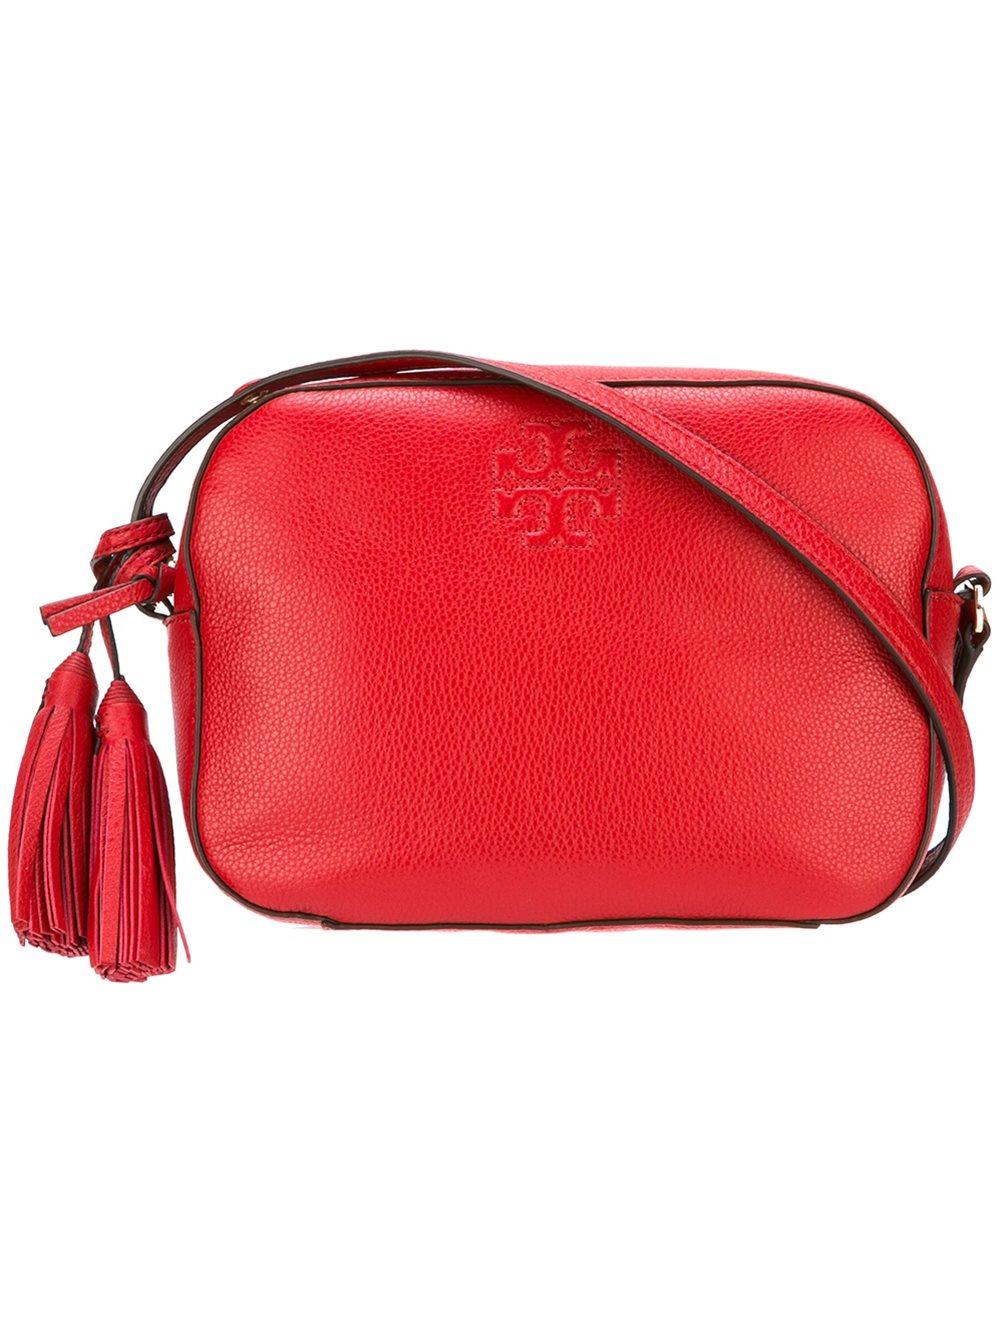 tory burch thea crossbody bag in red lyst